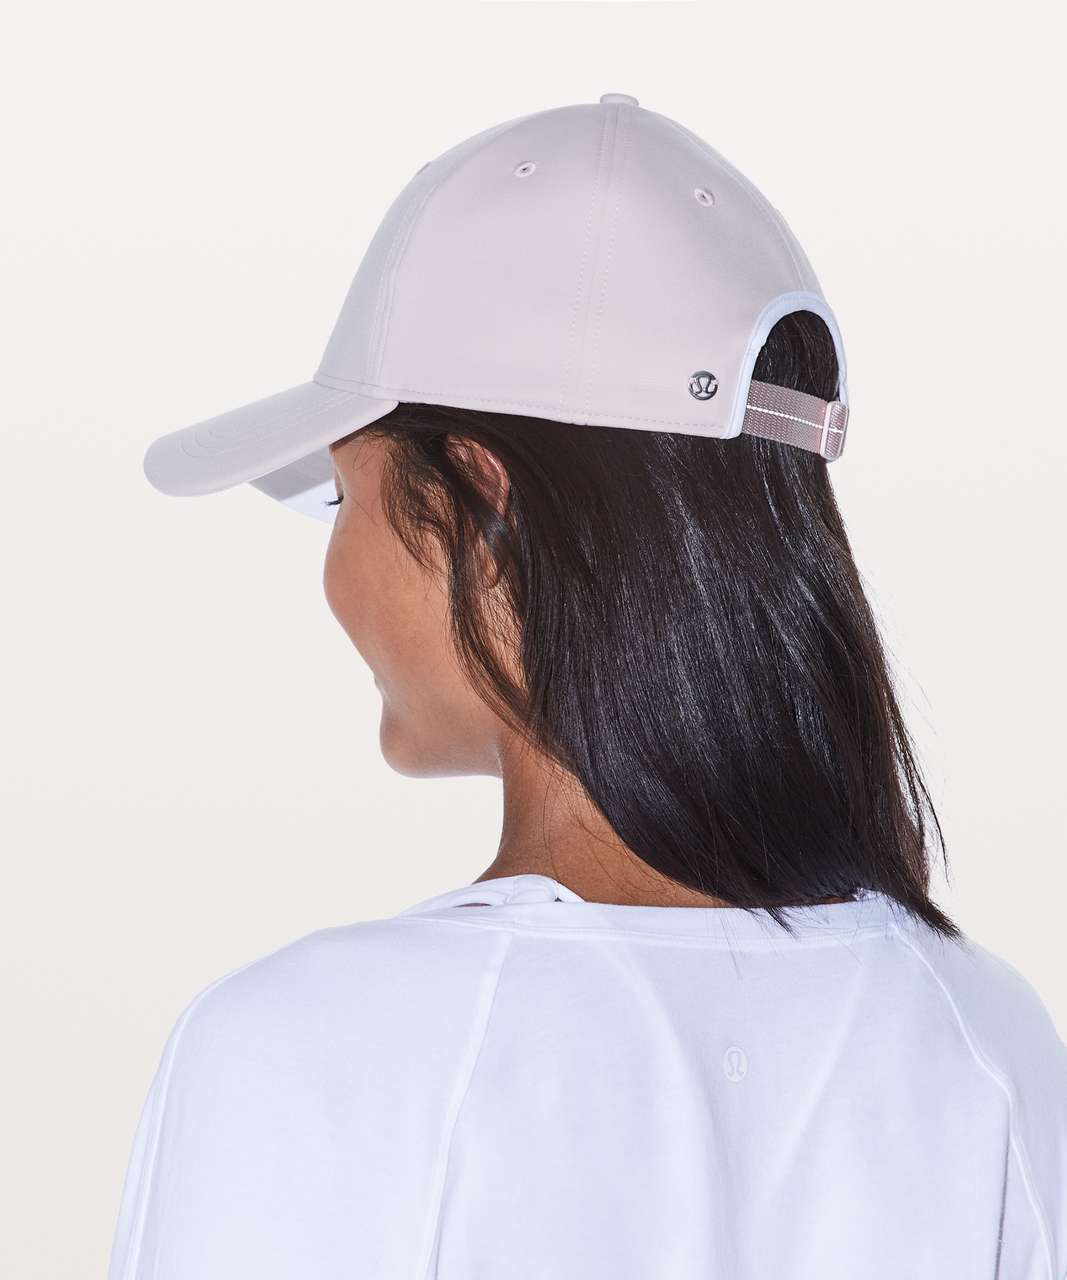 Lululemon Baller Hat - Misty Pink